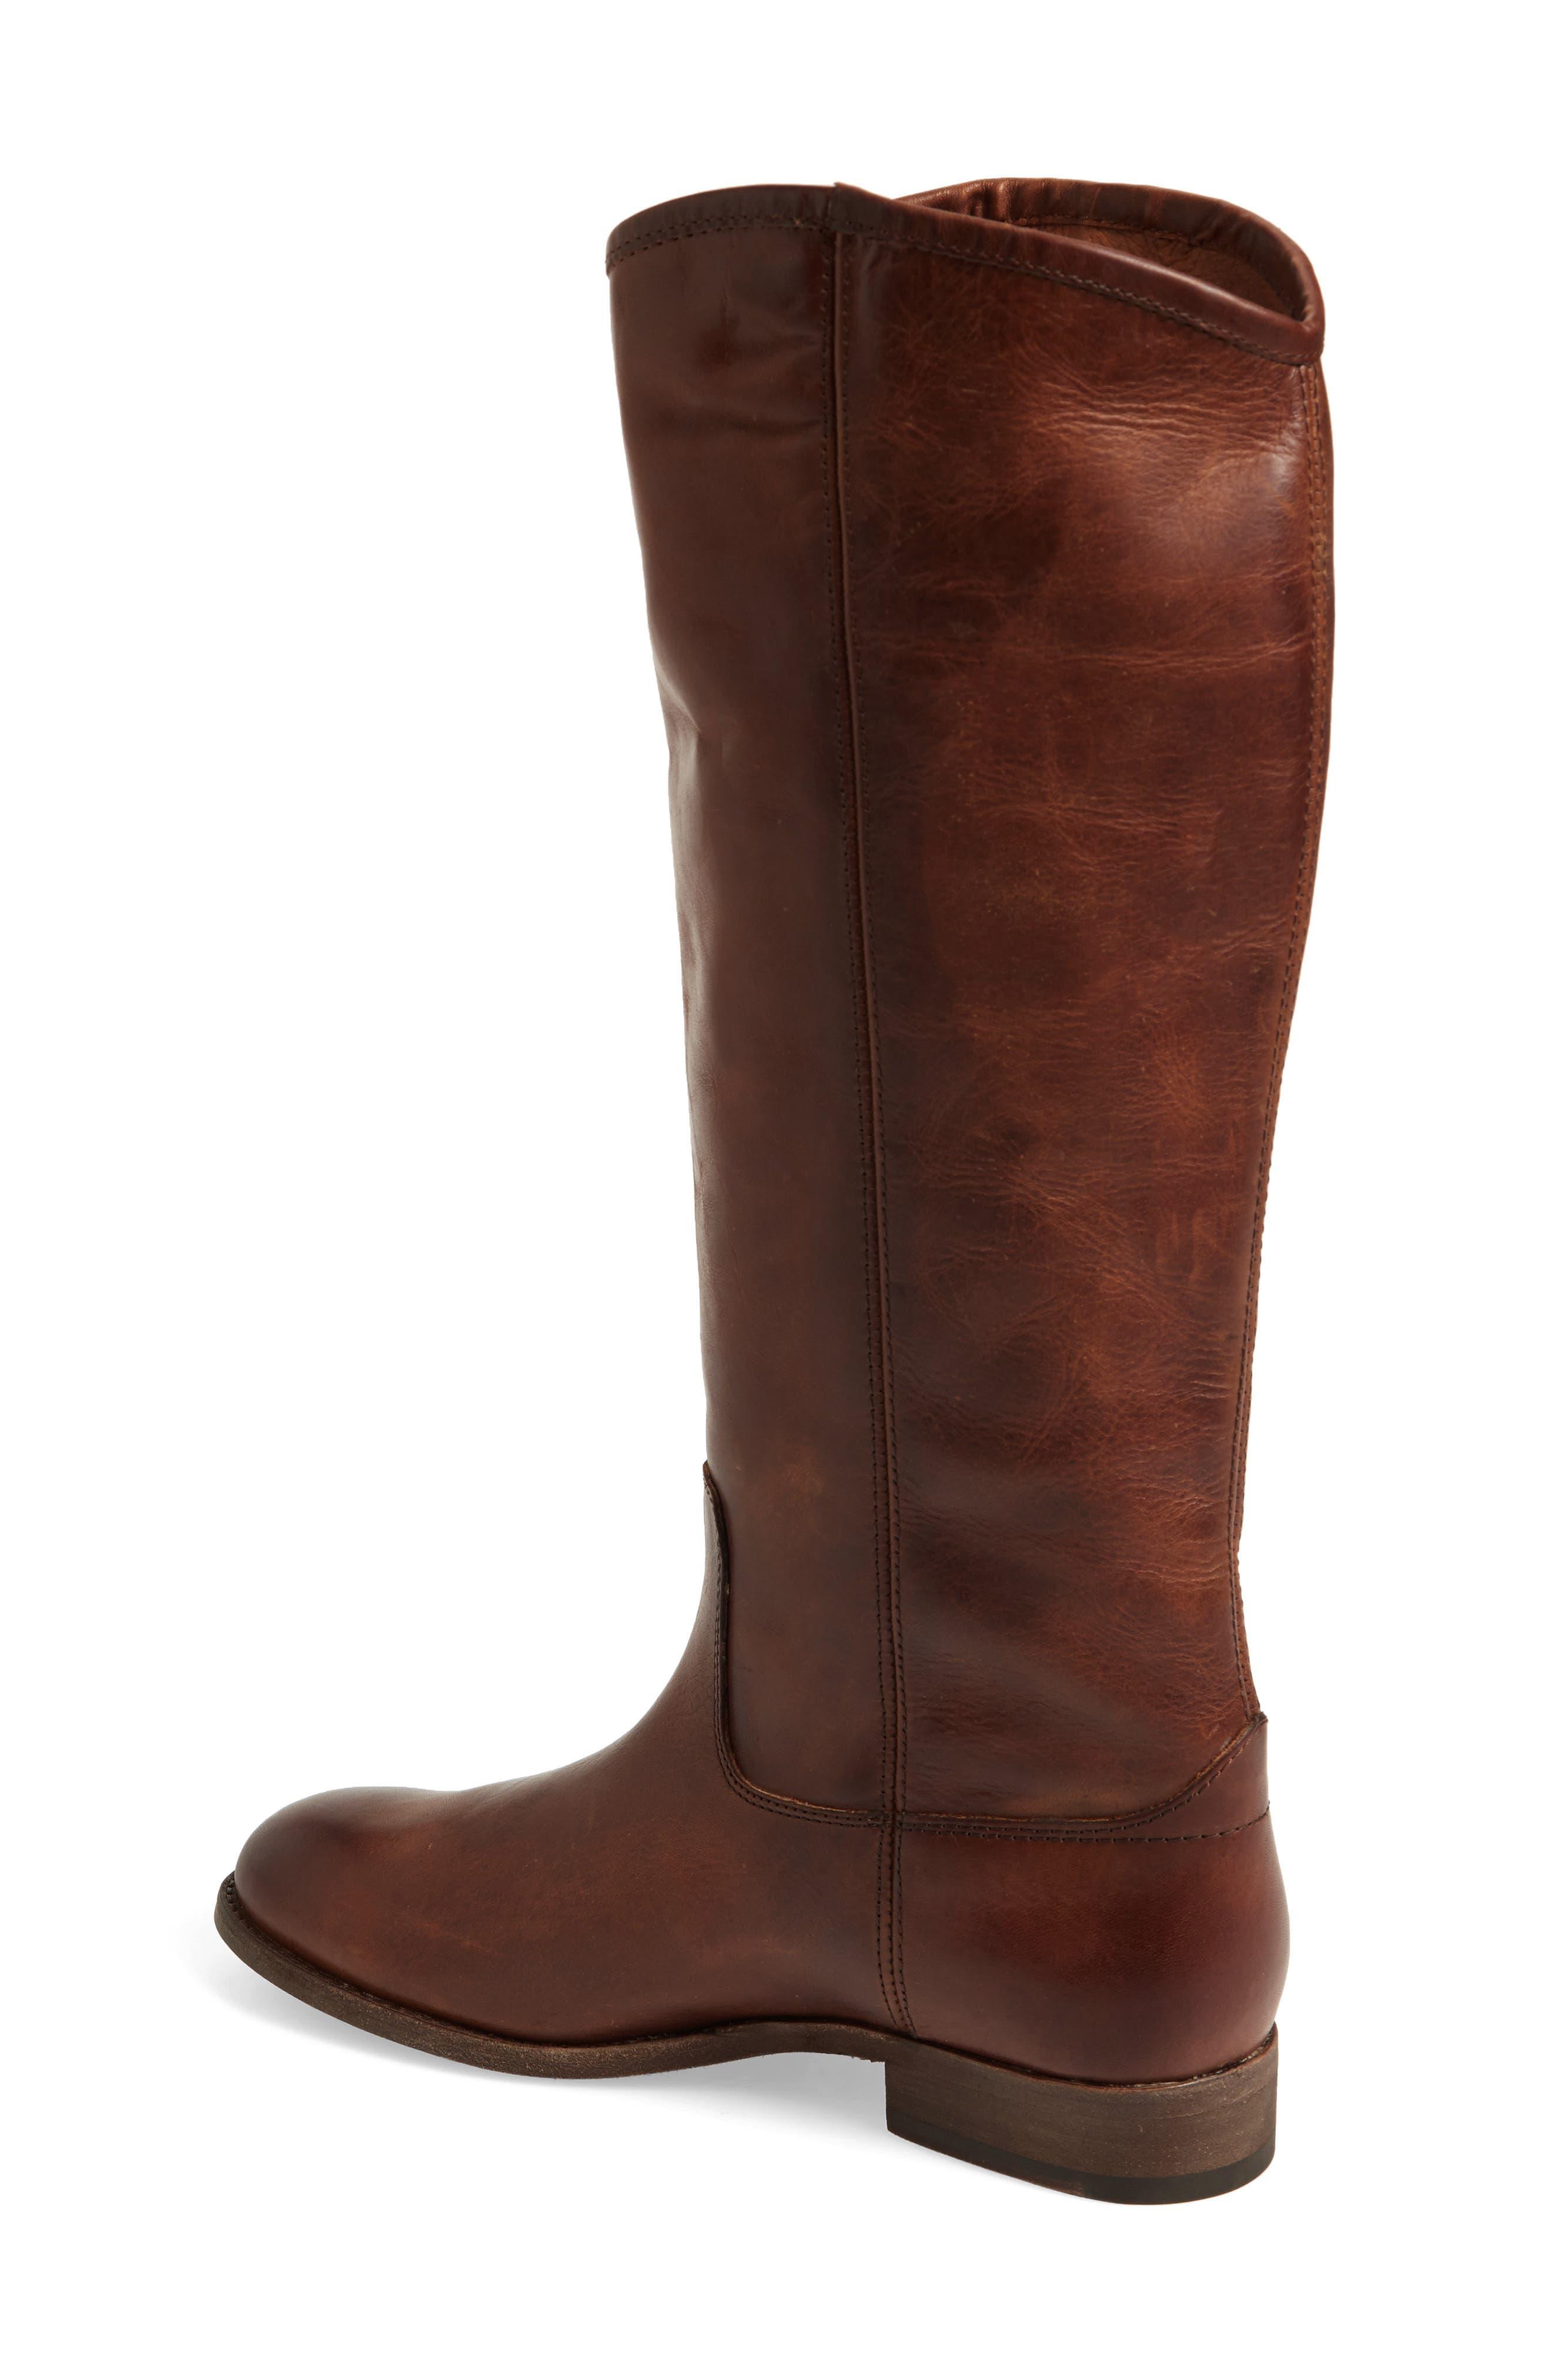 5792e8952b9 Women's Frye Boots | Nordstrom